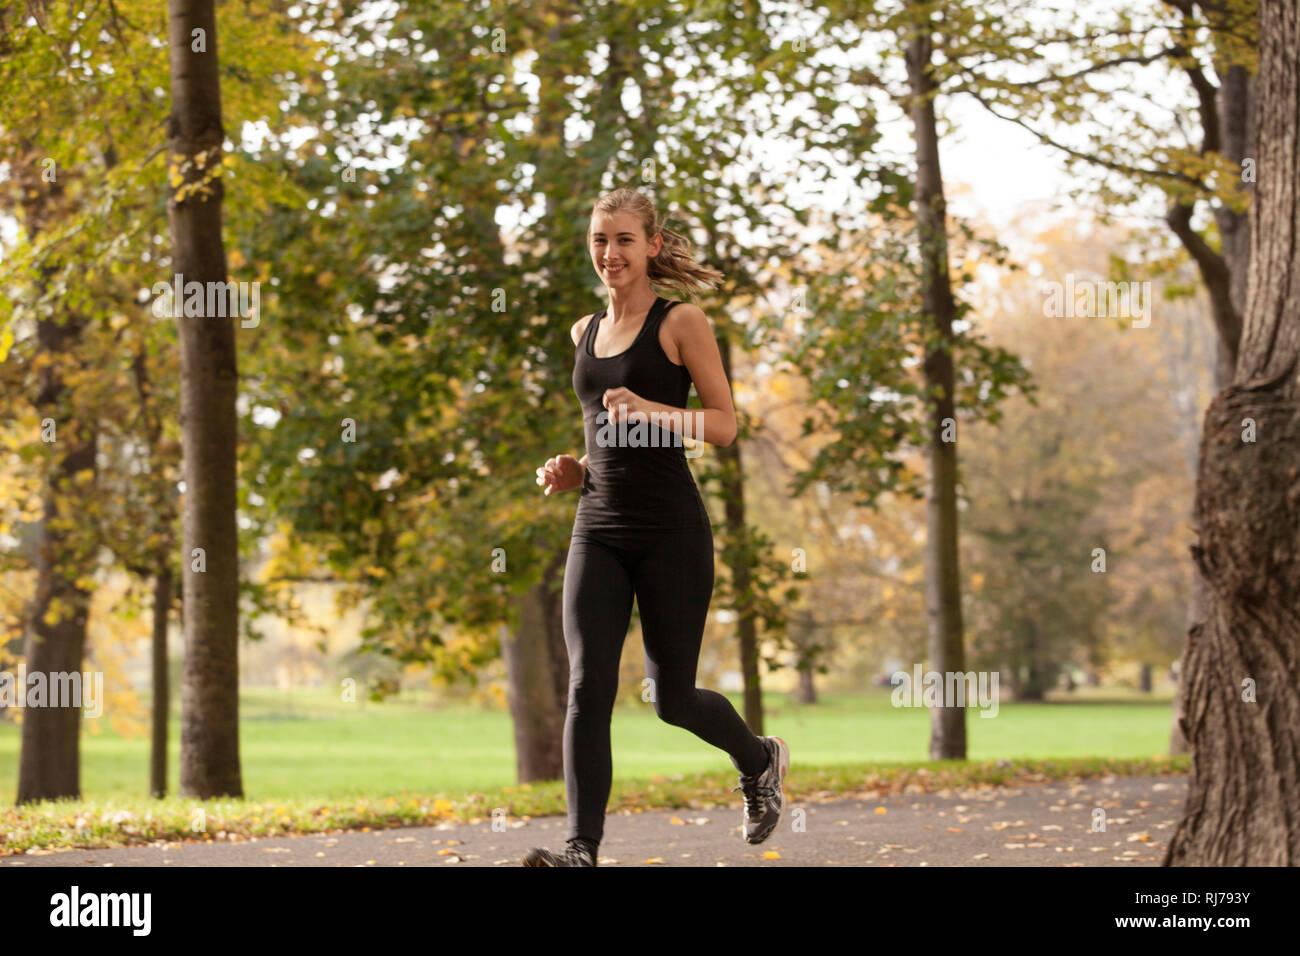 junge Frau joggt durch Park - Stock Image